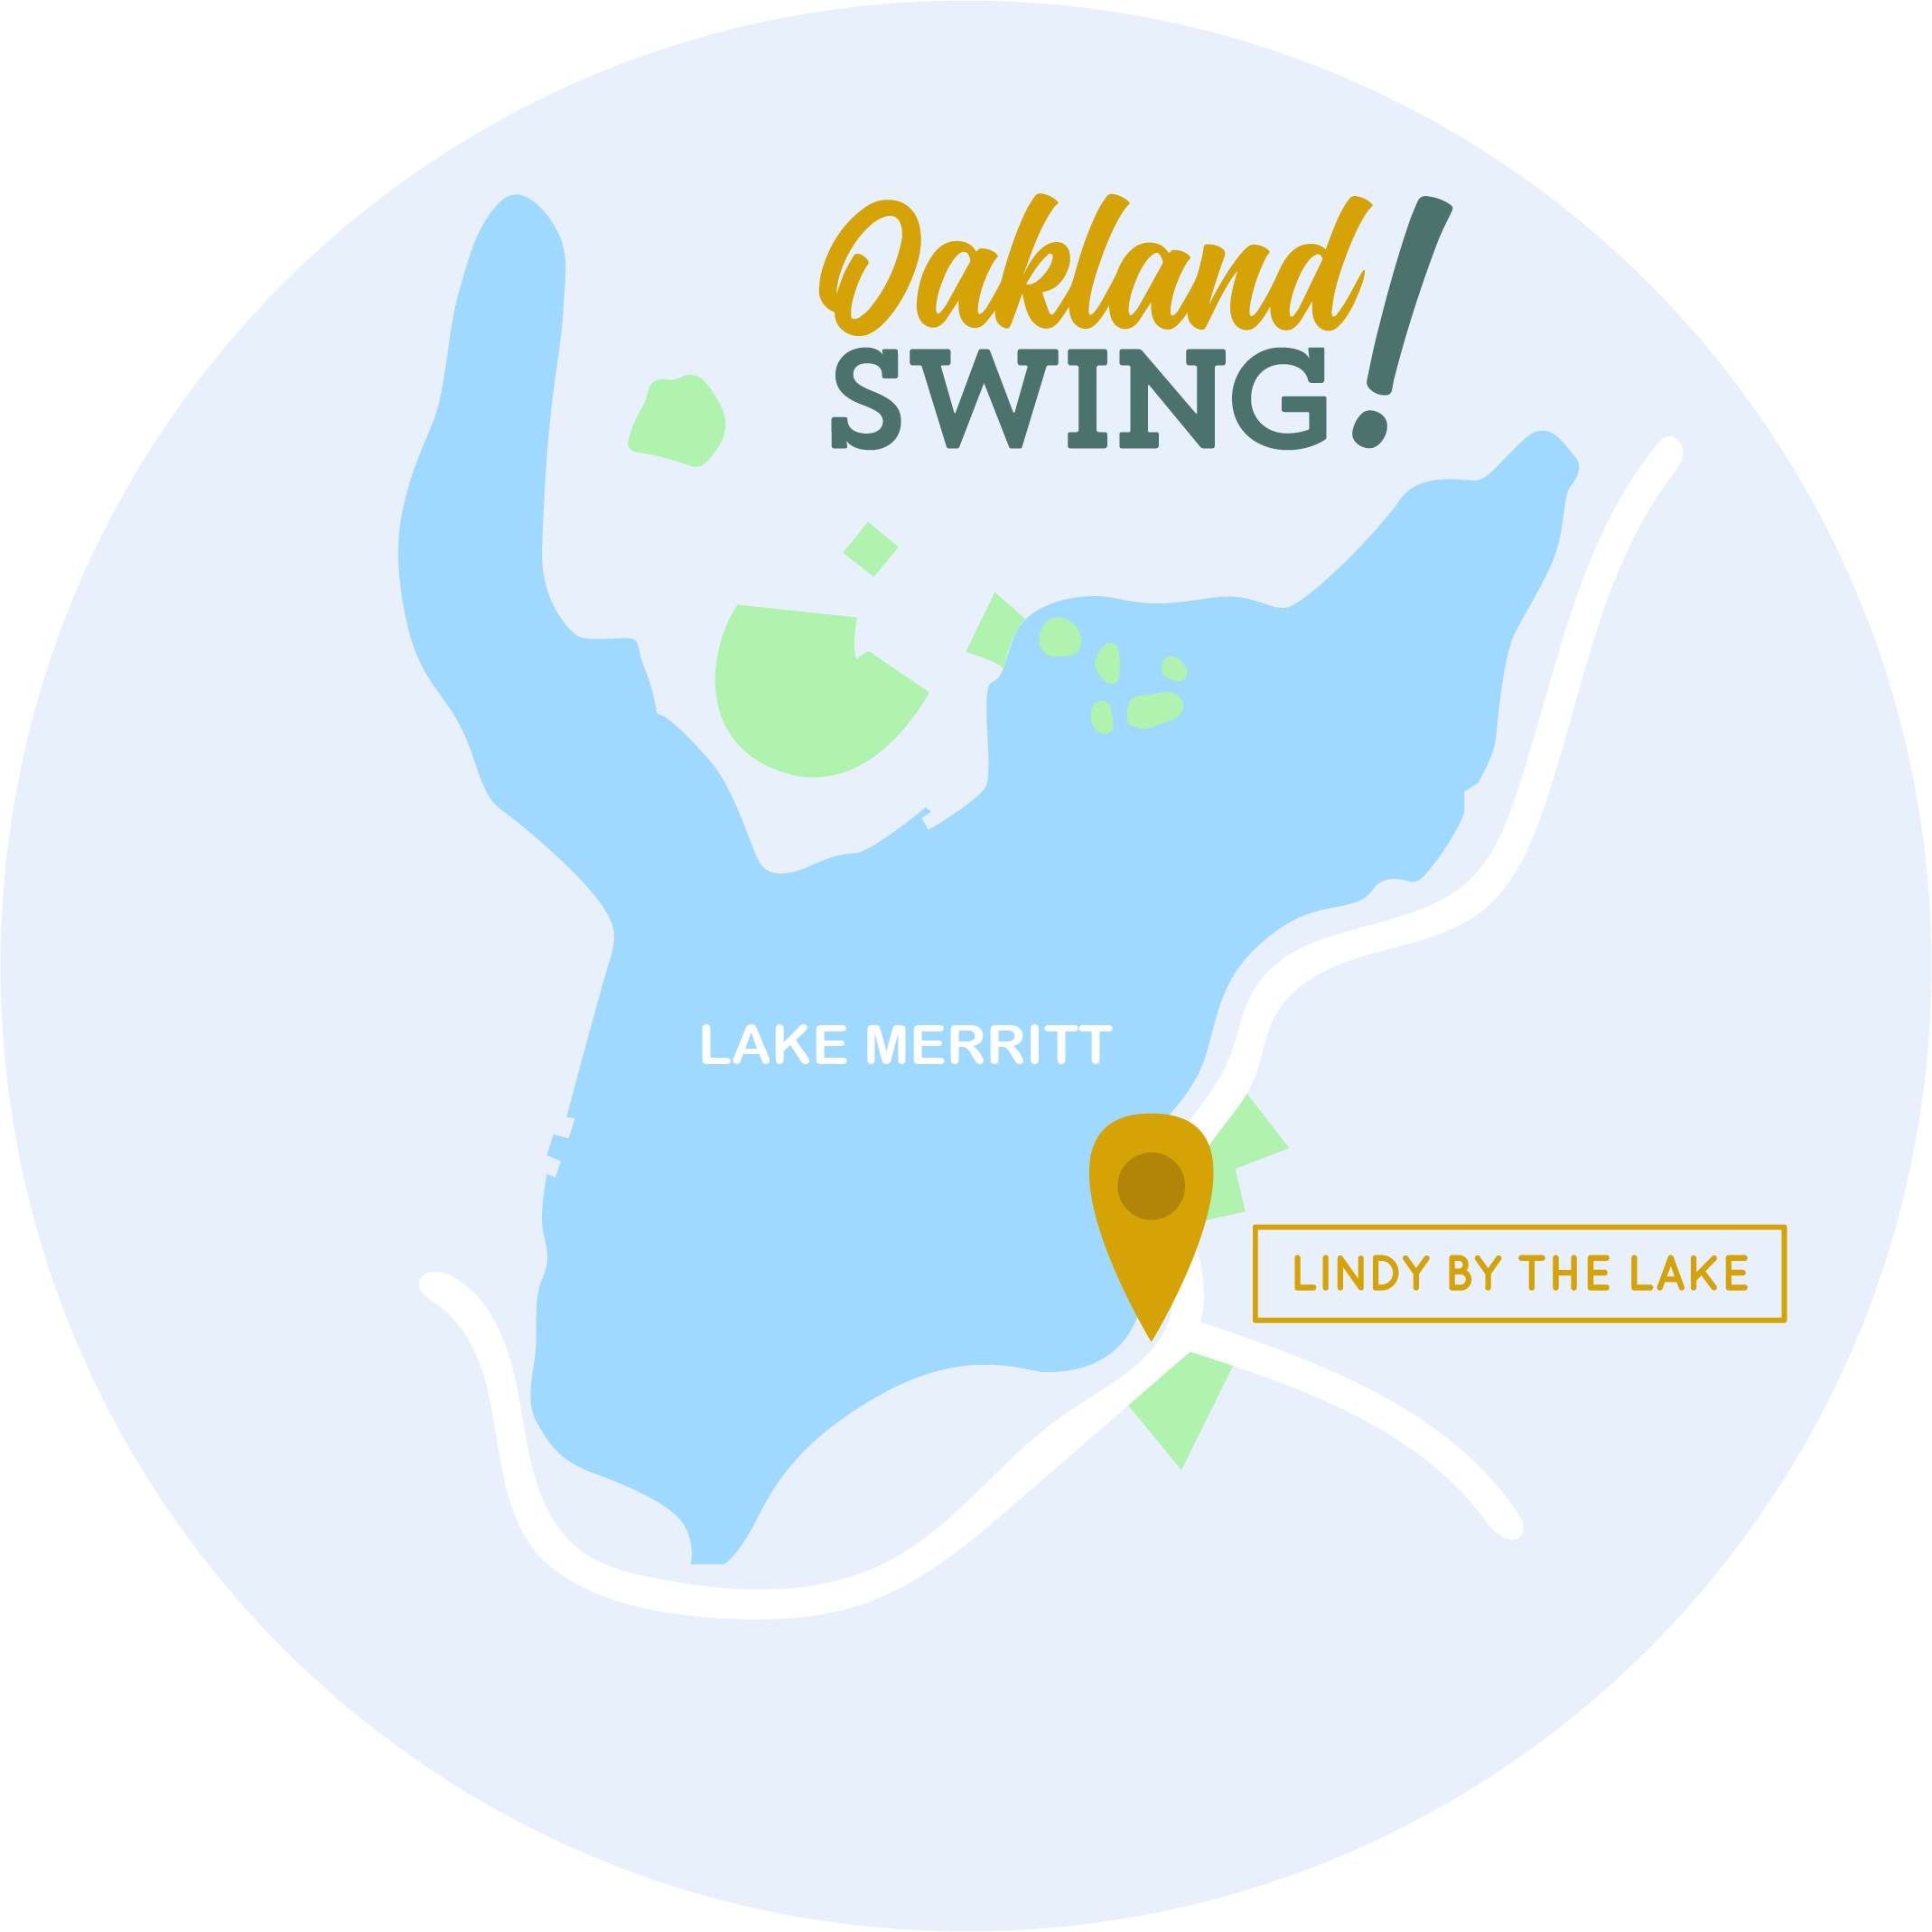 Oakland Swing, Lindy by the Lake, Map, Lake Merritt